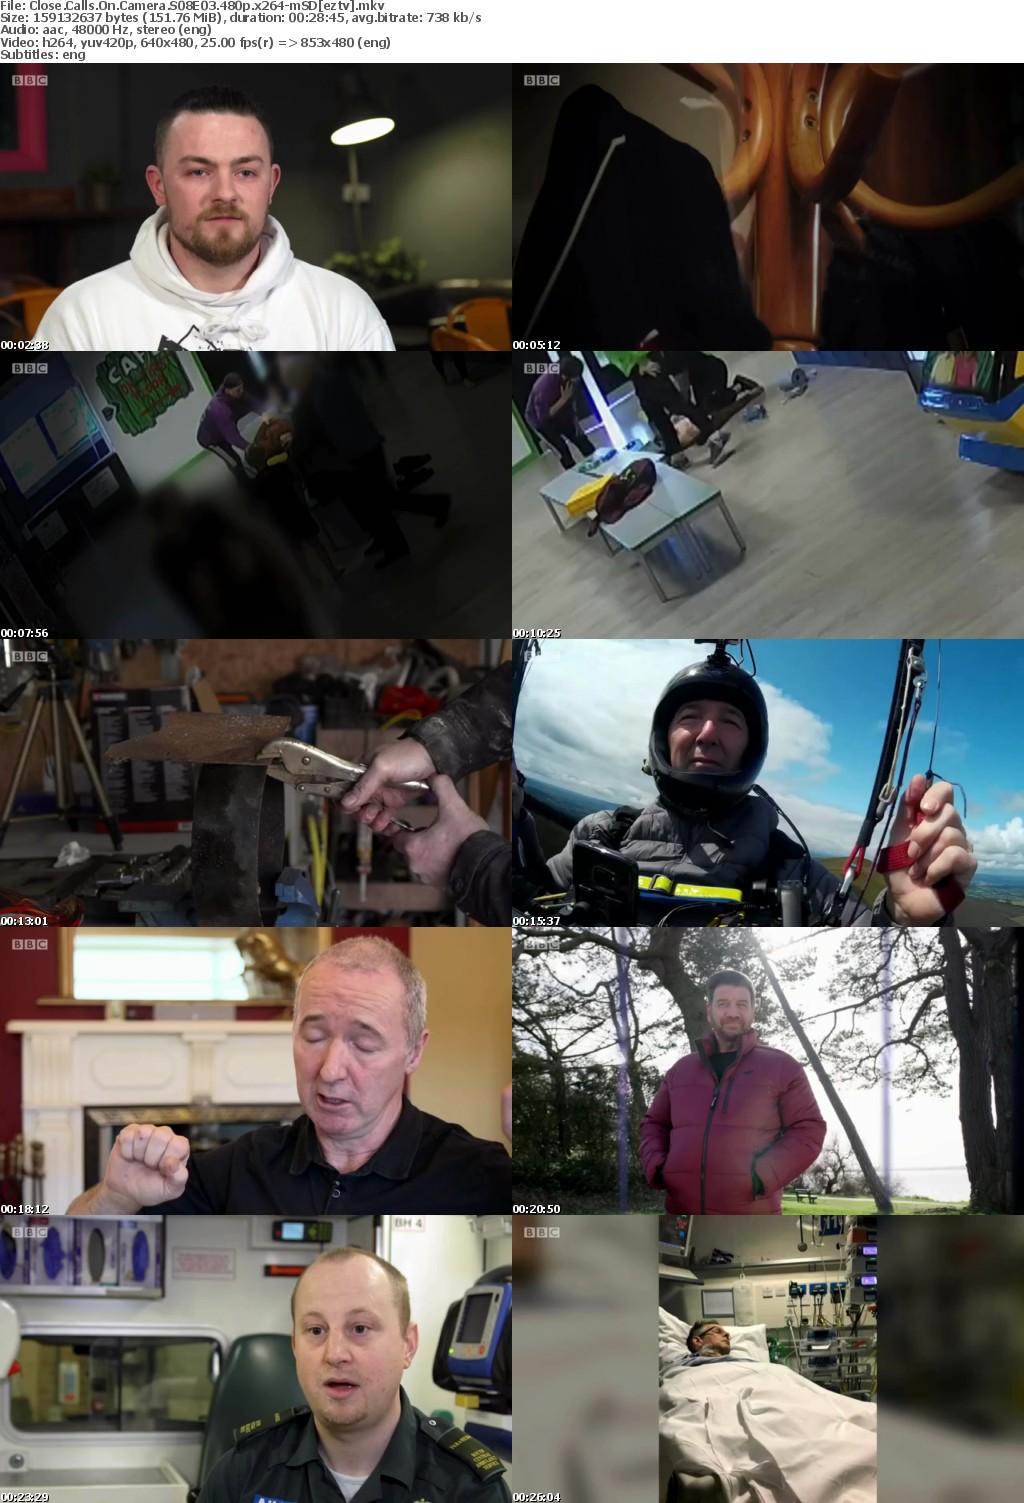 Close Calls On Camera S08E03 480p x264-mSD